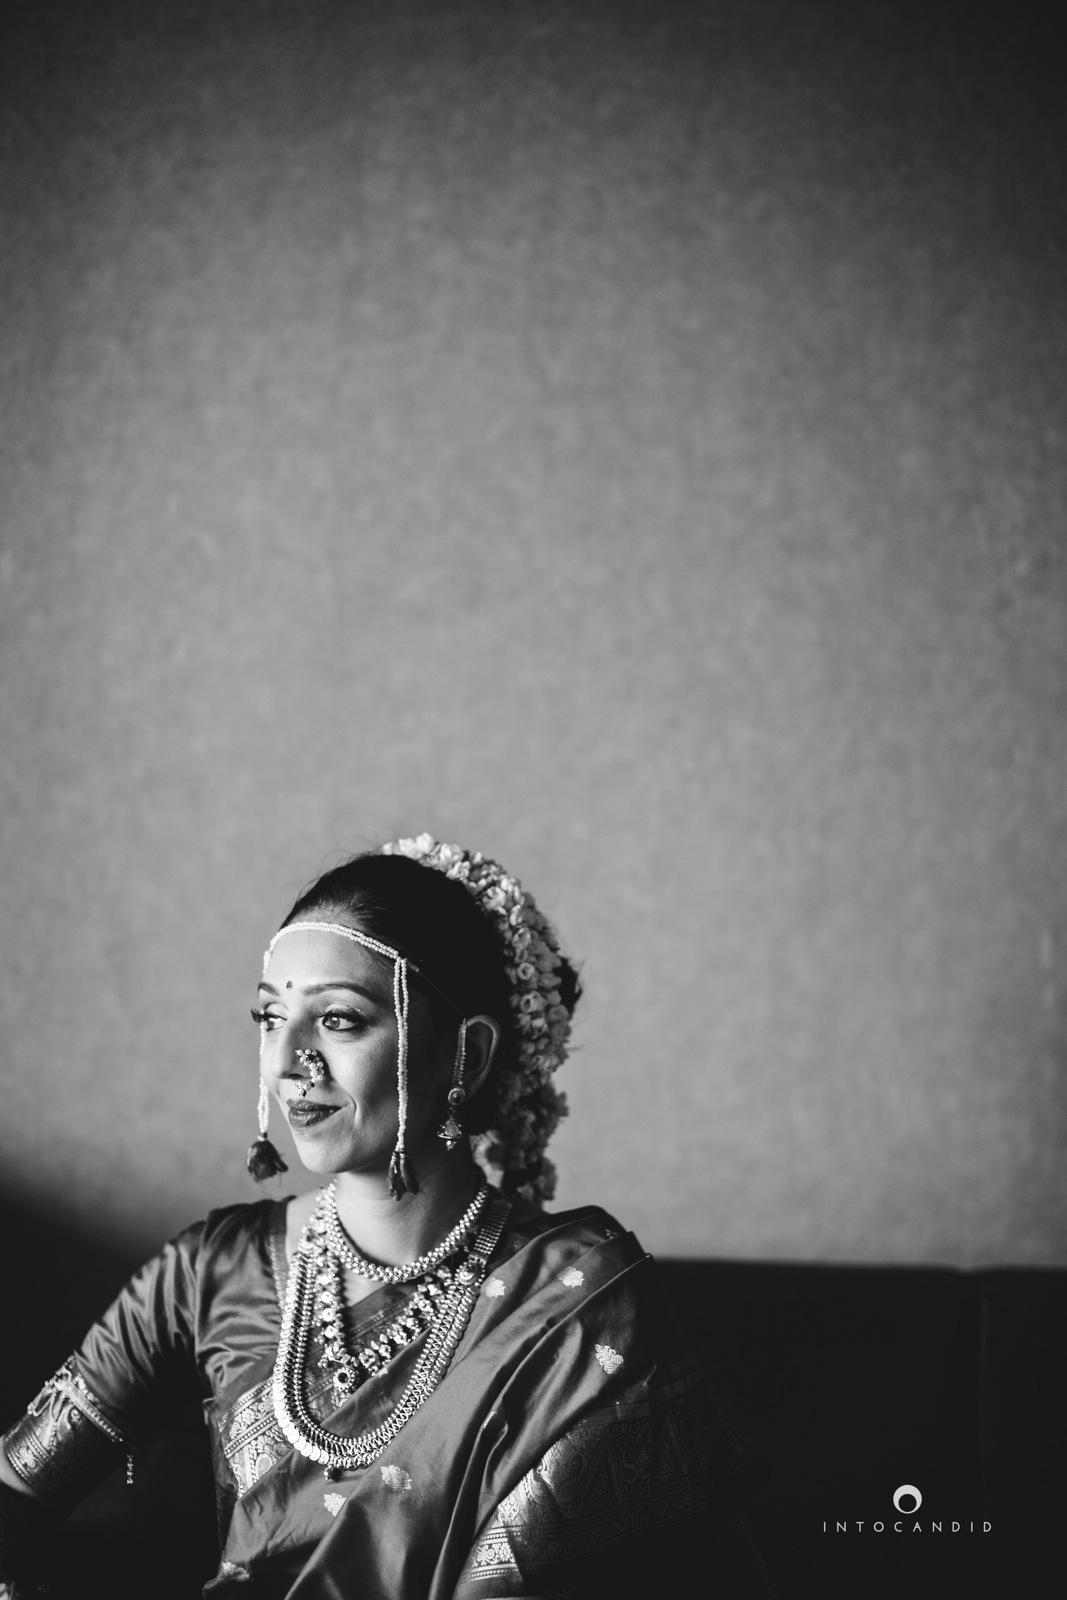 mumbai-wedding-photographers-intocandid-maharashtrian-wedding-photography-sa-12.jpg